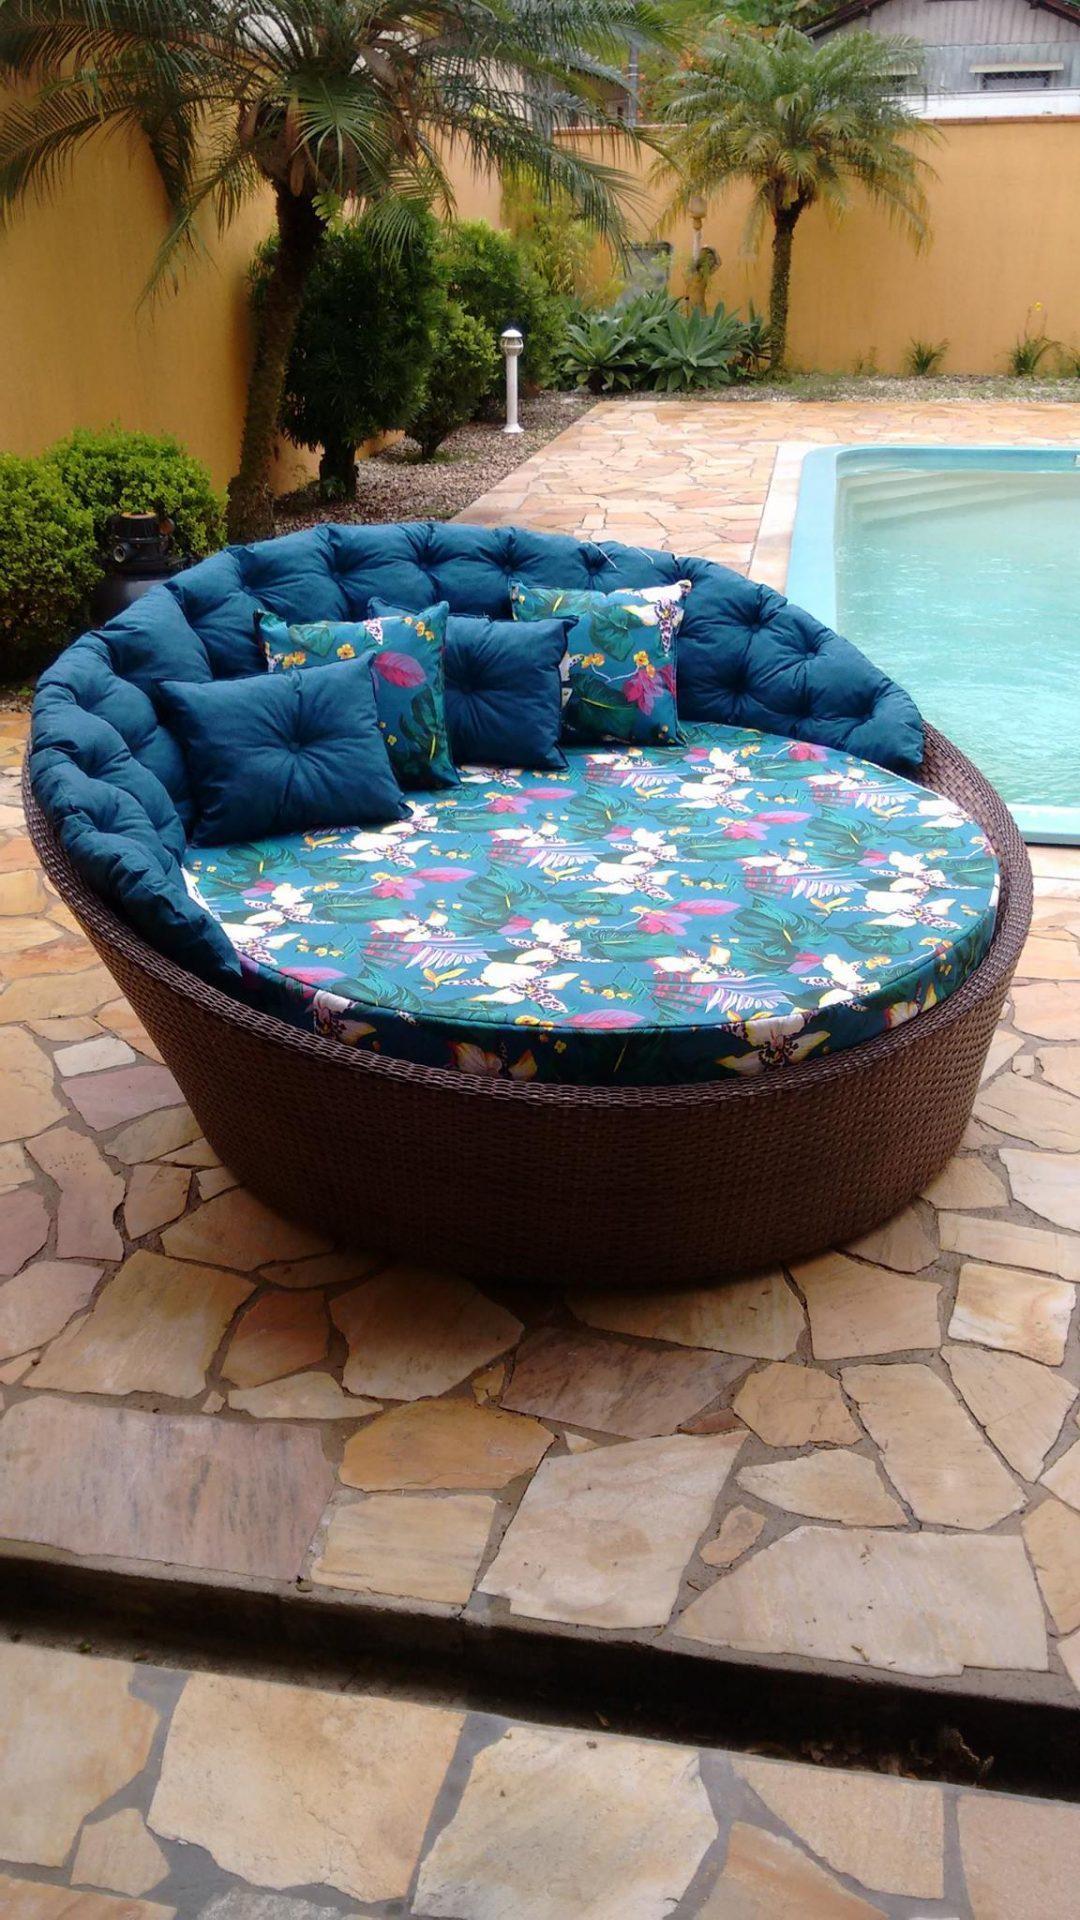 mam-moveis-chaises-chaise-ofuro-com-futton-almofadas-em-fibra-sintetica-para-terracos-varandas-e-jardins-haidee